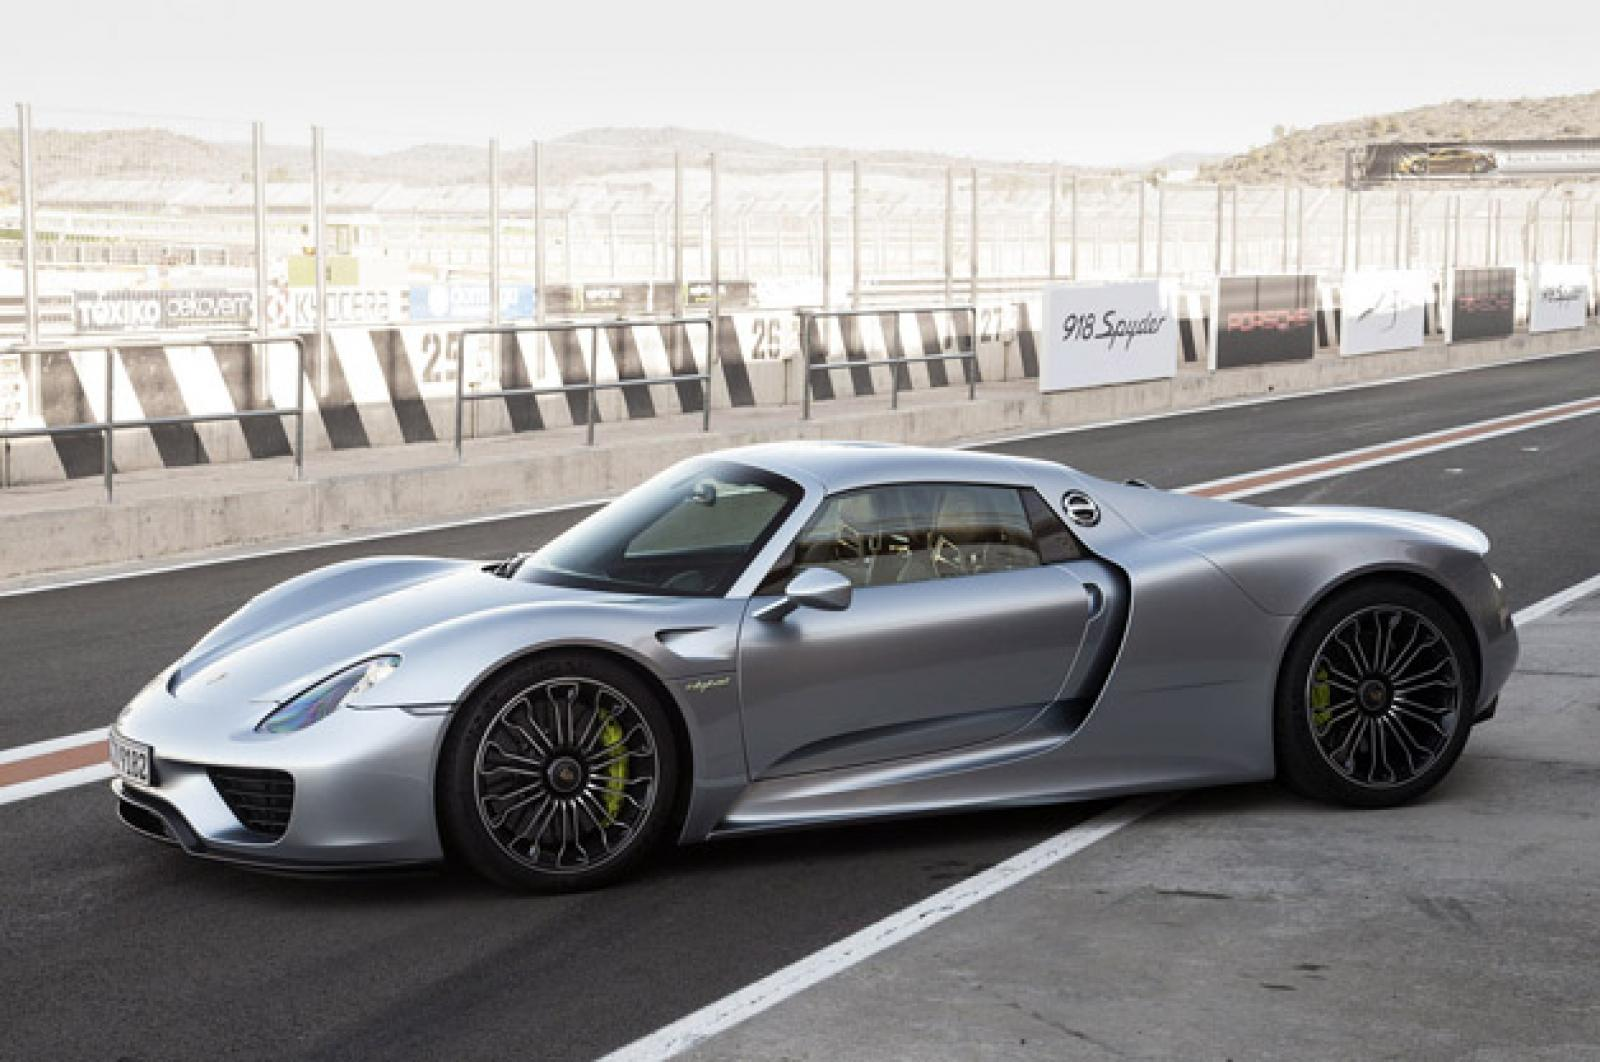 2015 Porsche 918 Spyder 1 800 1024 1280 1600 Origin